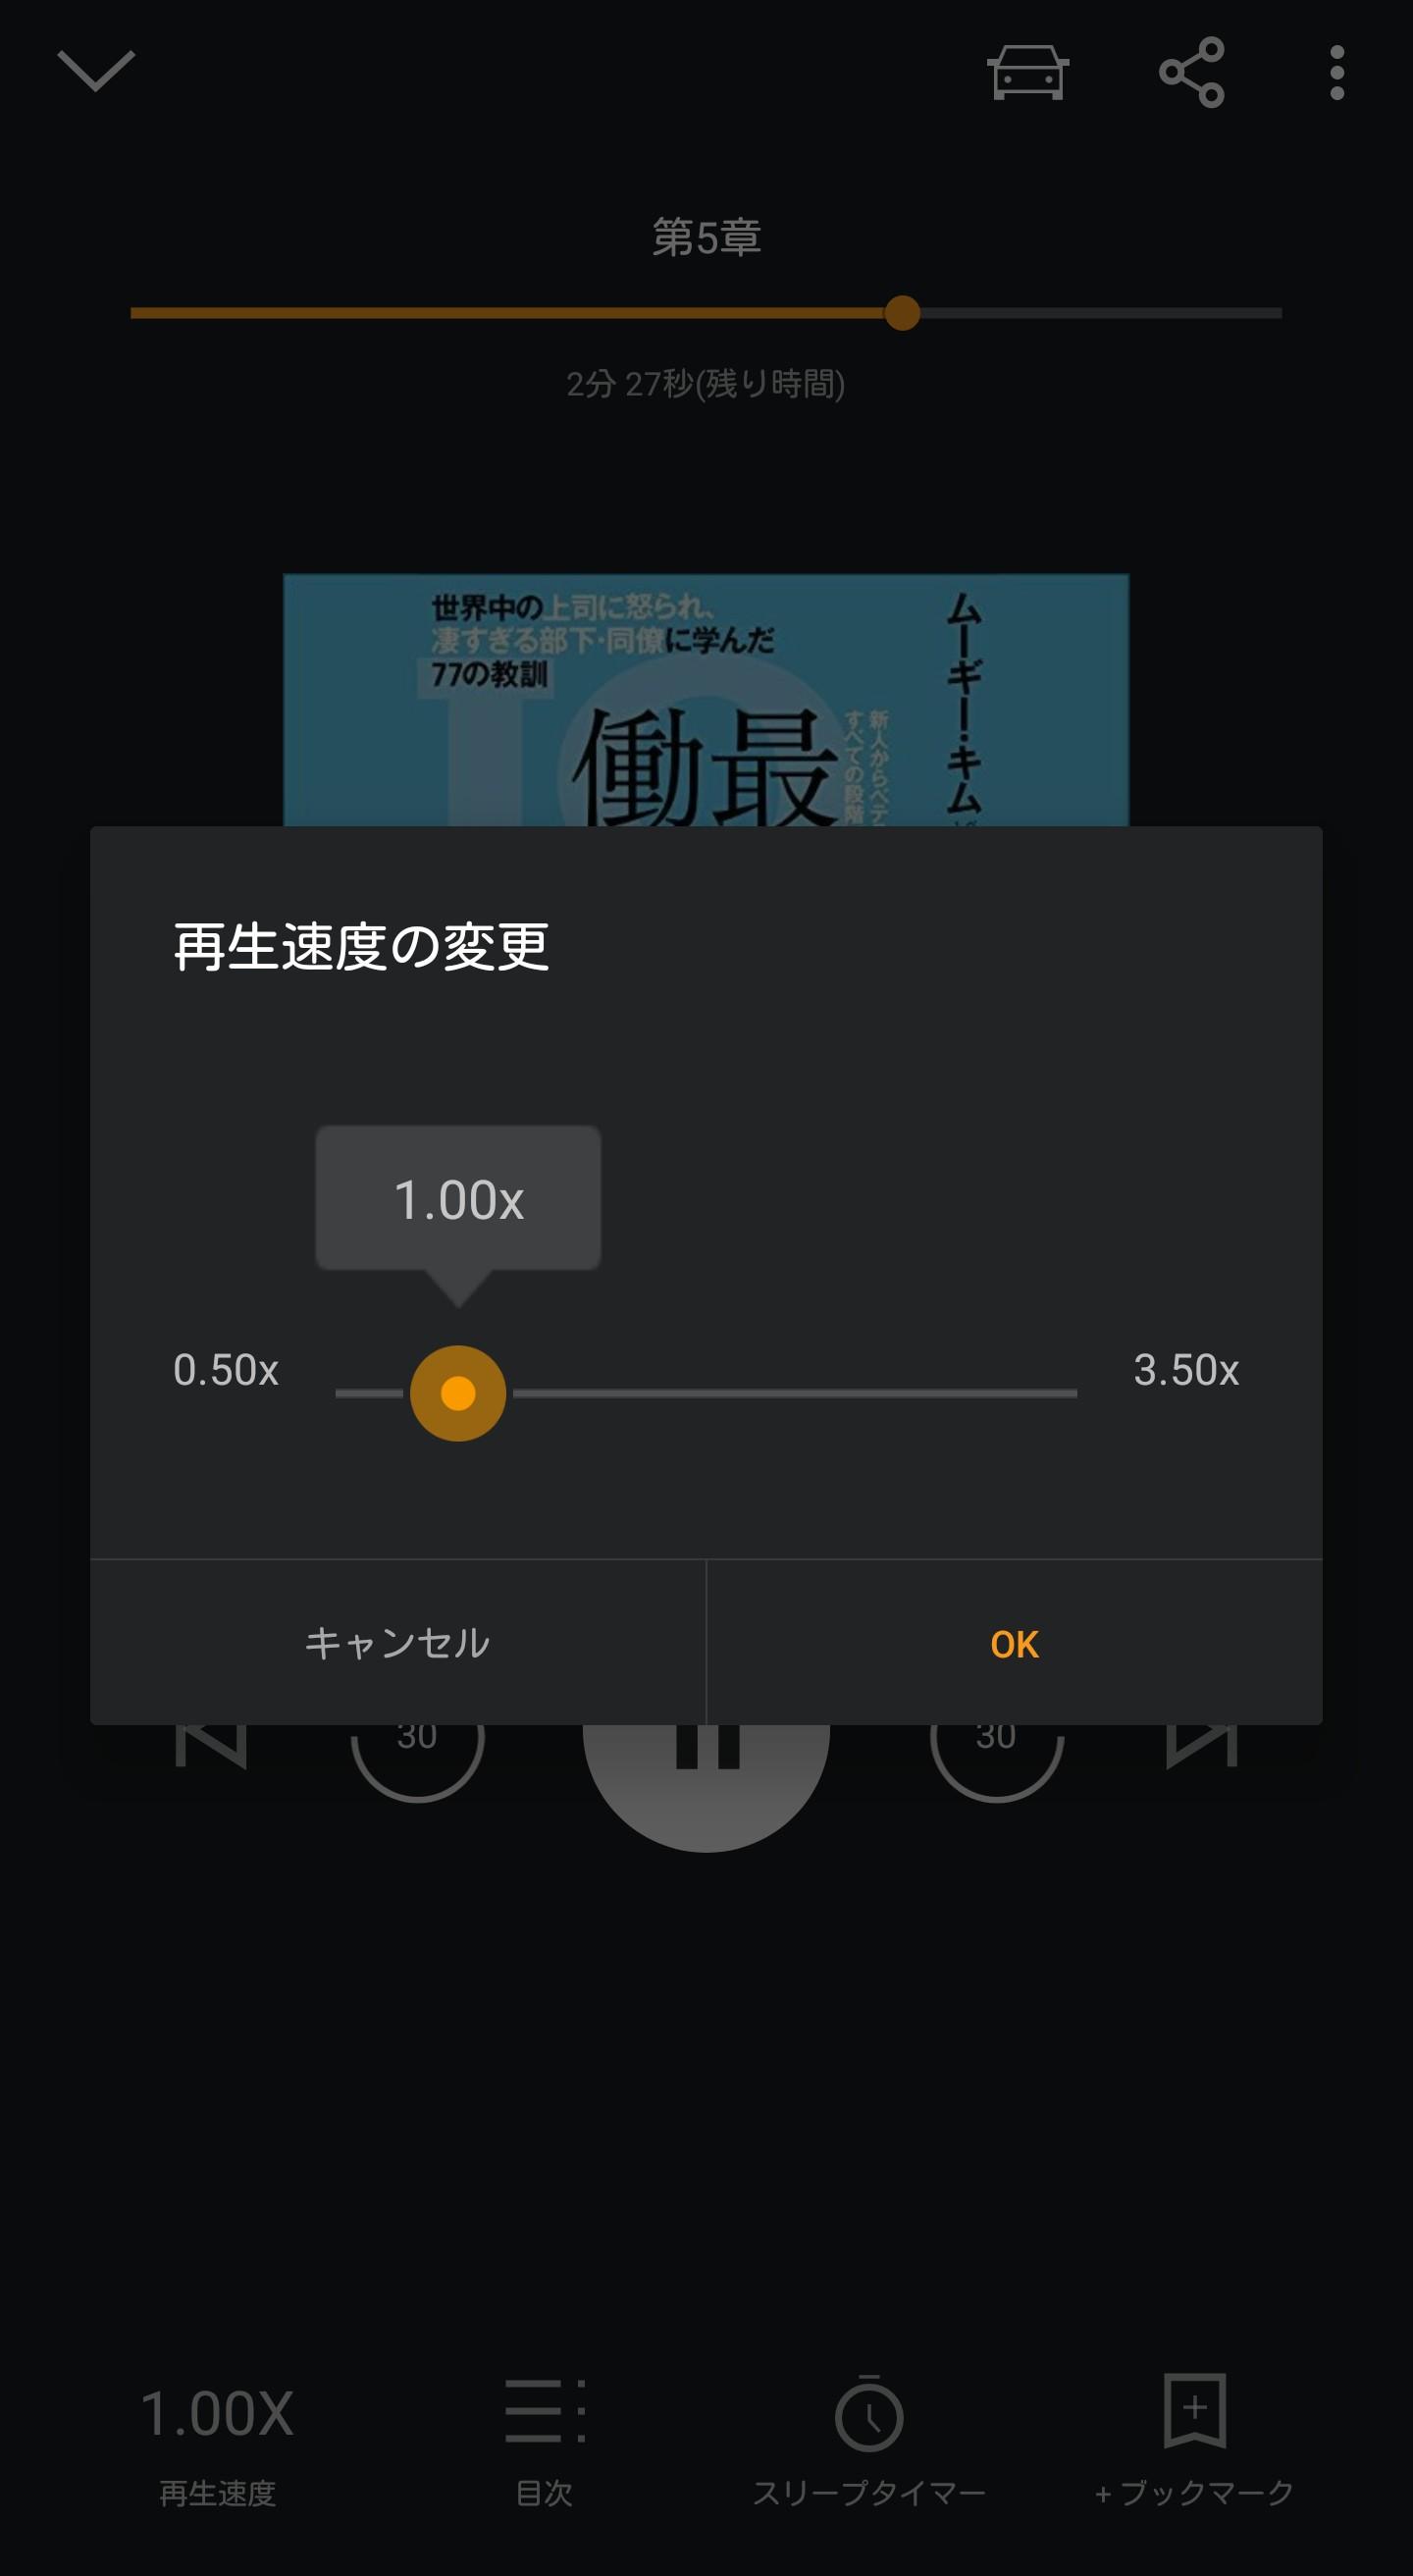 f:id:Re_hirose:20181020100224j:image